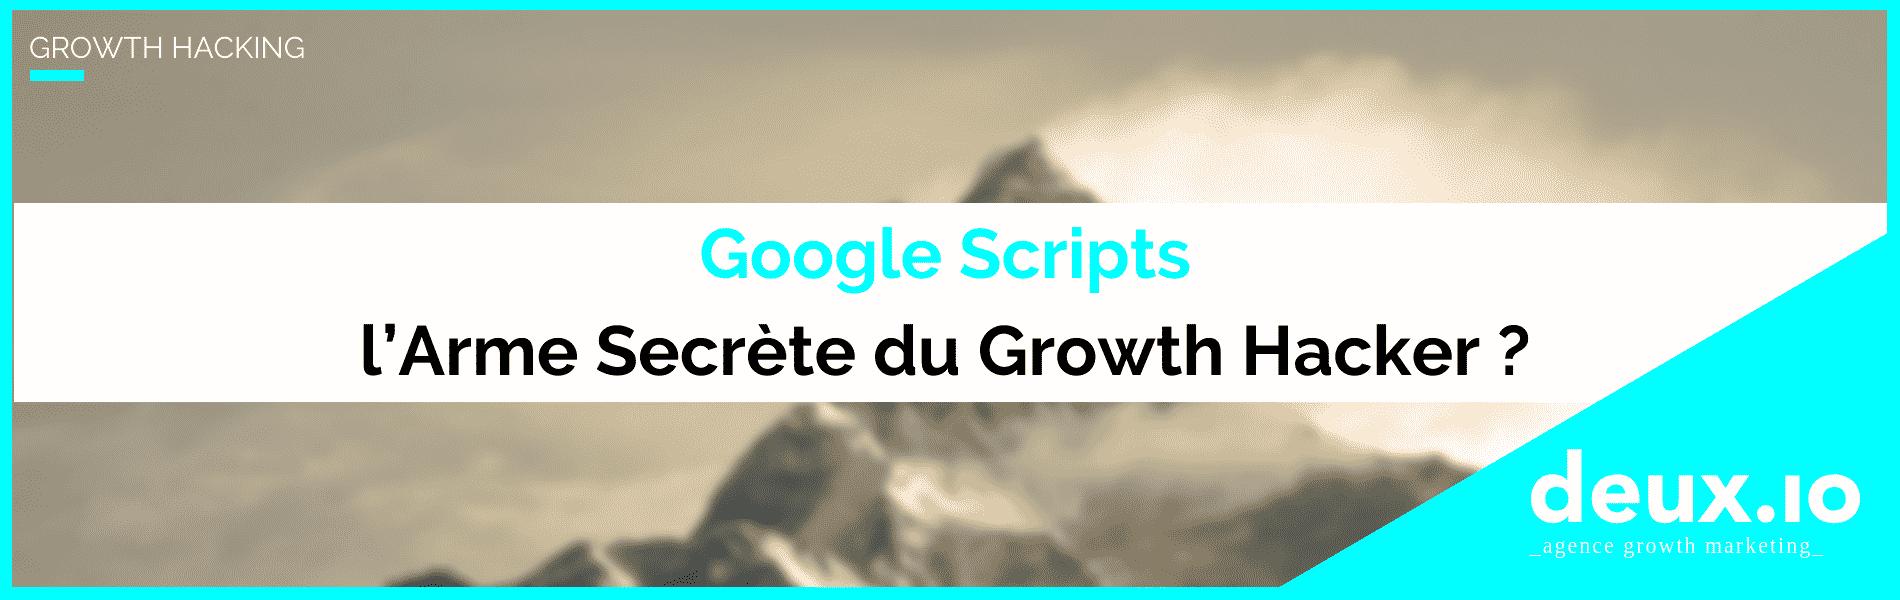 google script featured